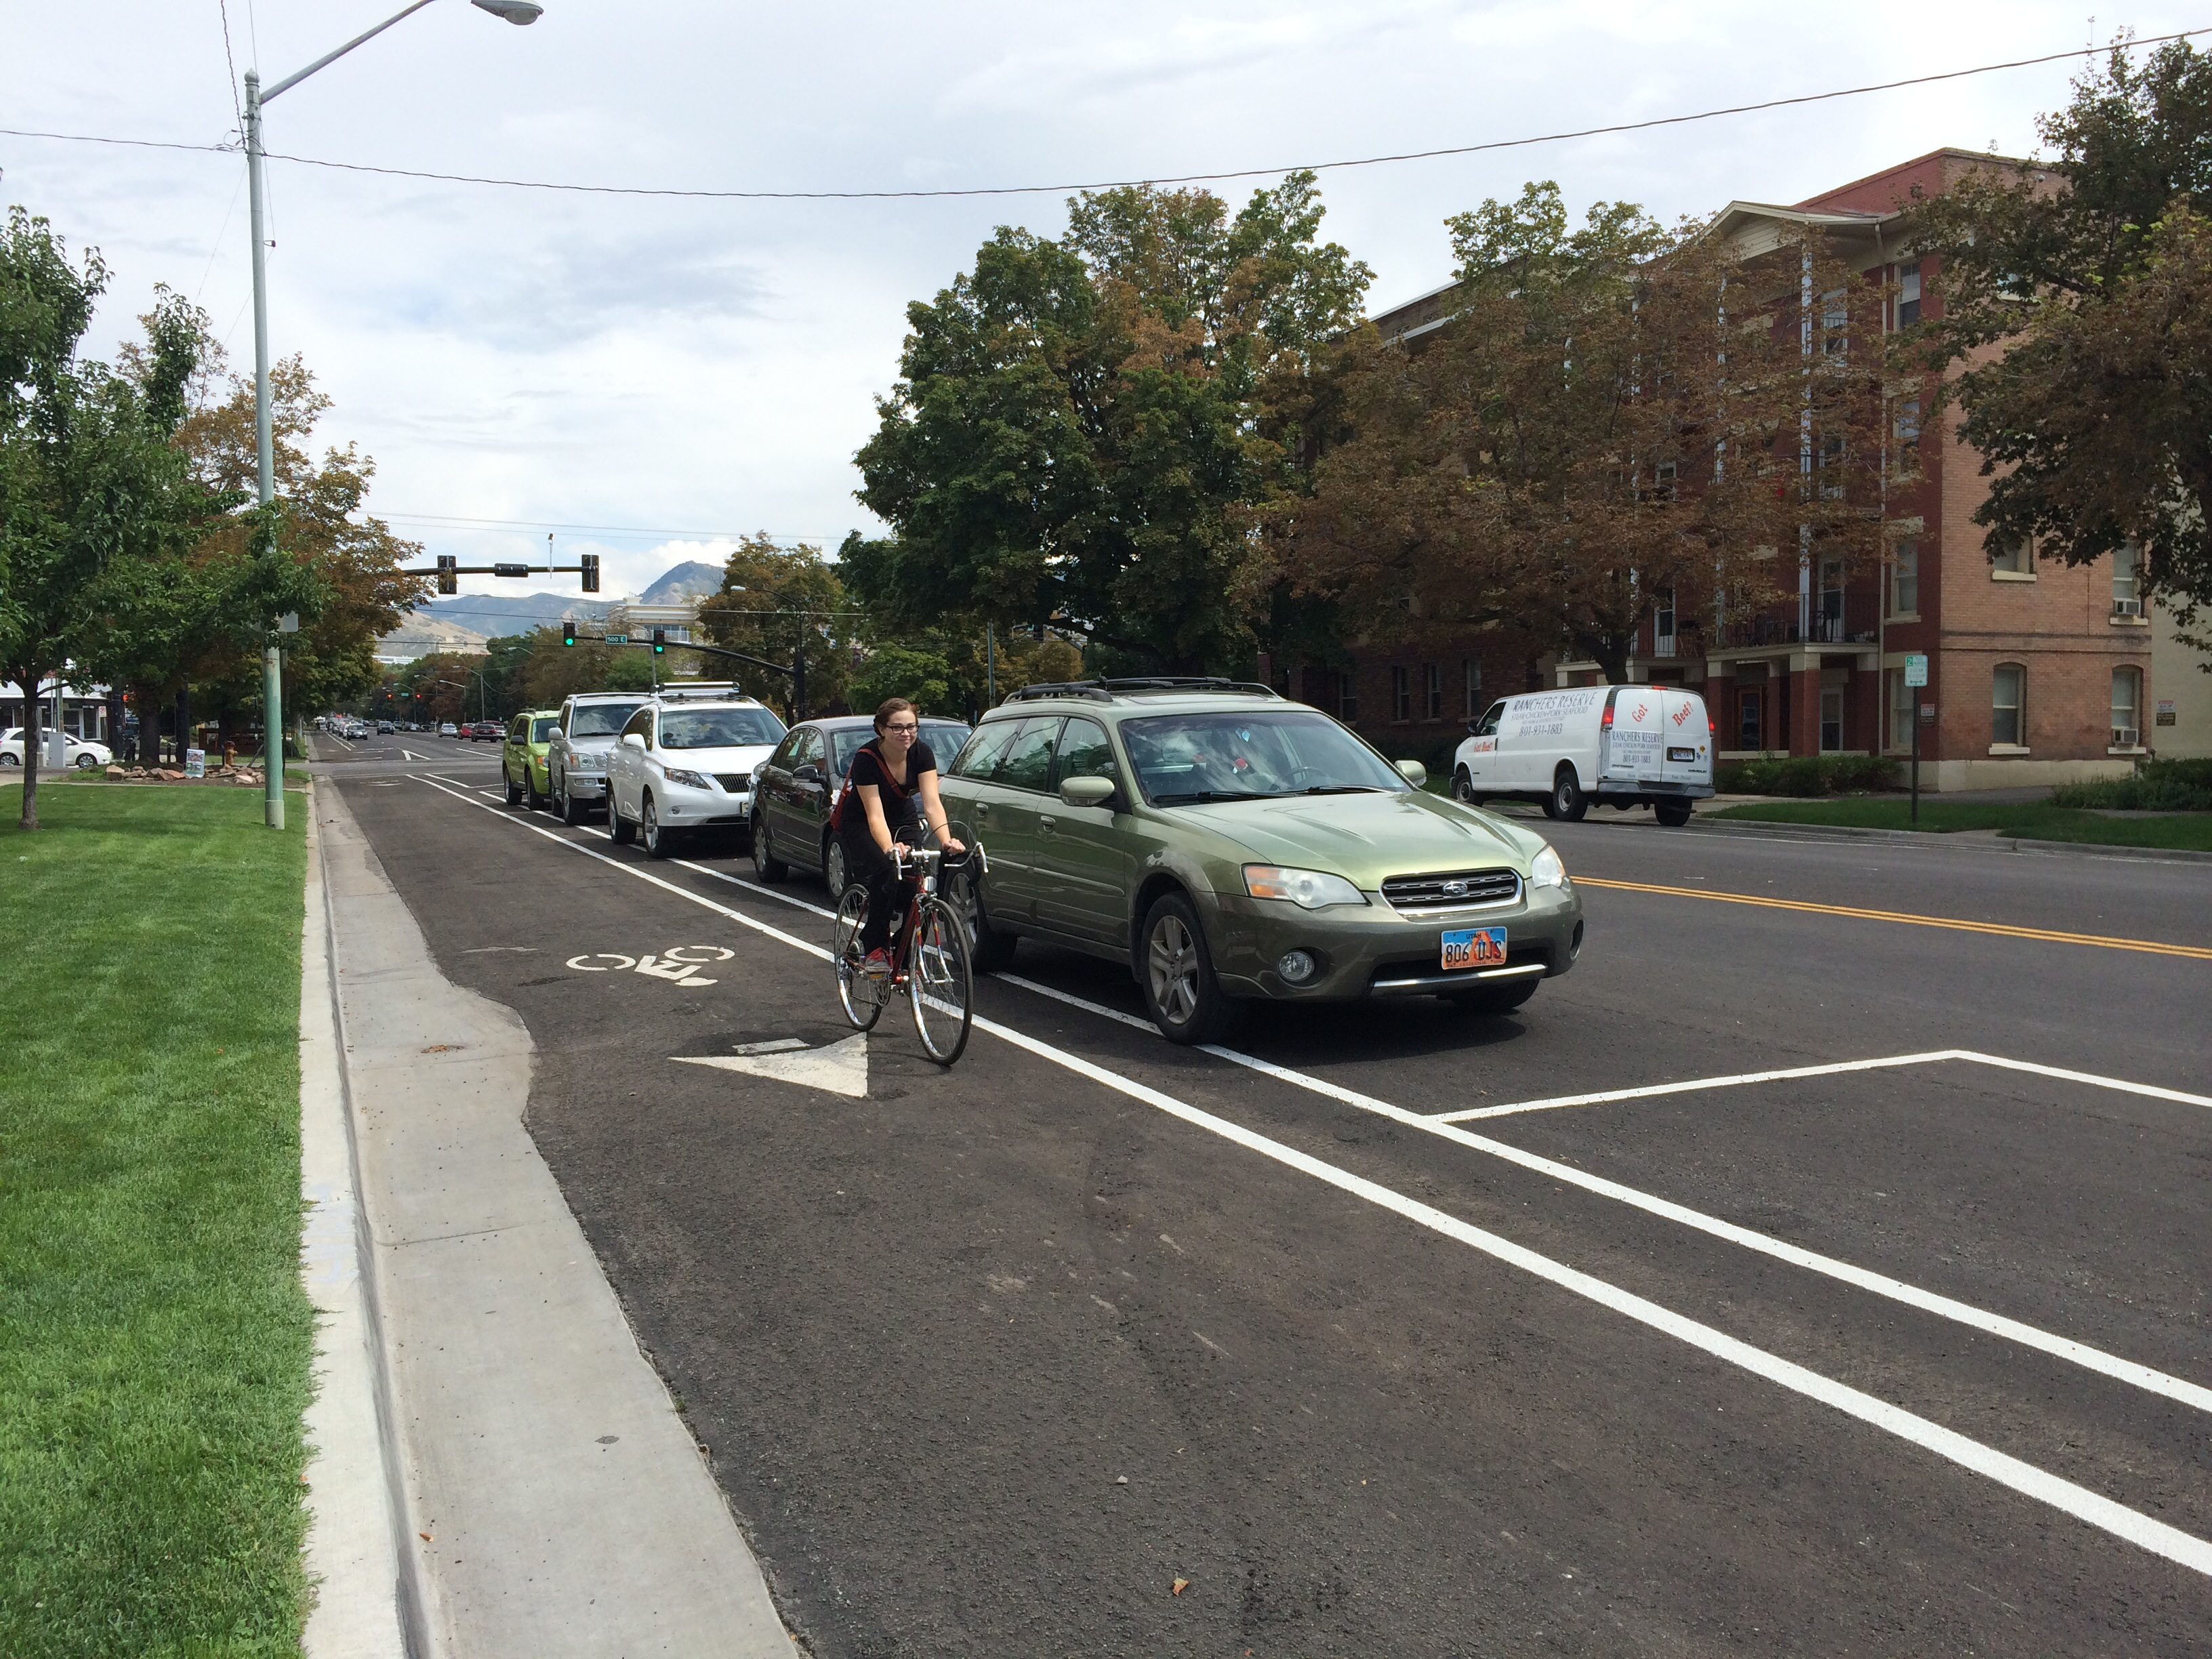 Salt Lake City's 300 S. bikeway separates bikes from cars. Photo by Dave Iltis